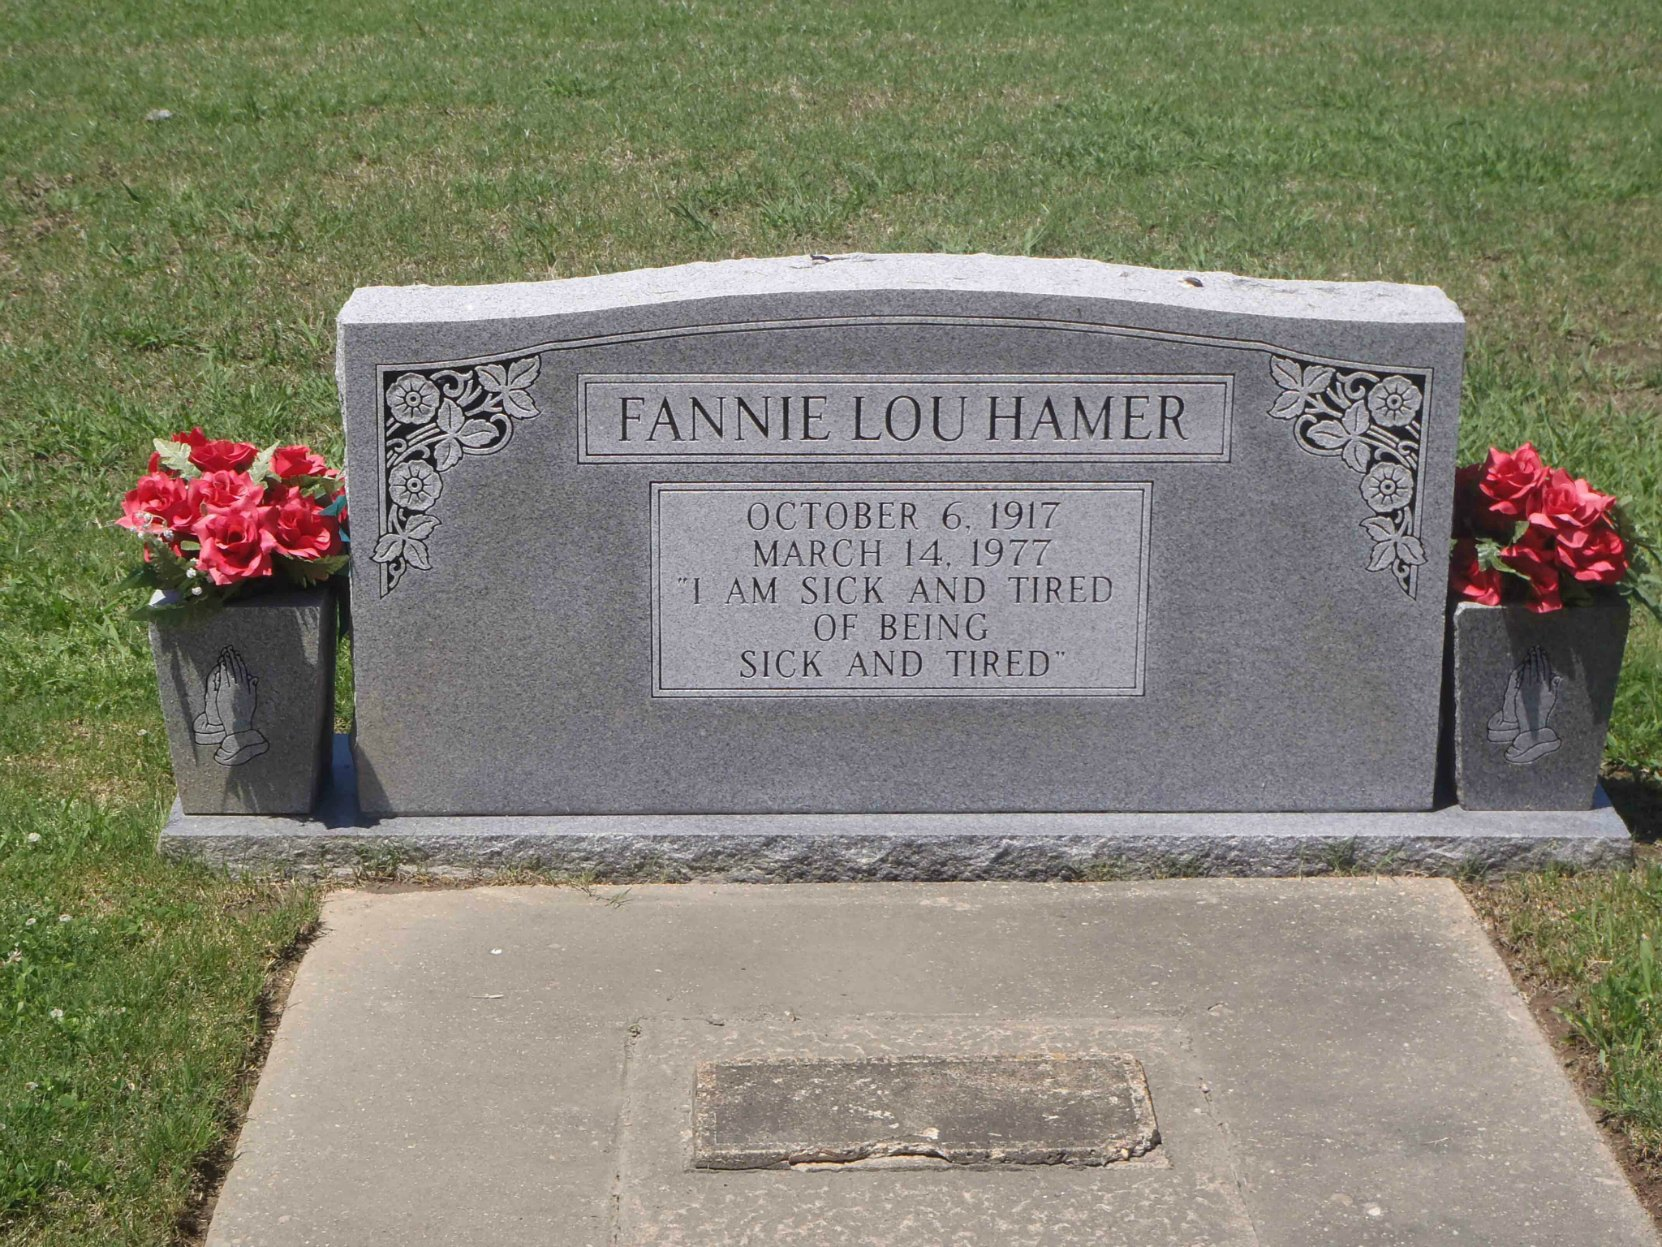 Headstone on Fanny Lou Hamer's grave, Fanny Lou Hamer Memorial Garden, Ruleville, Mississippi